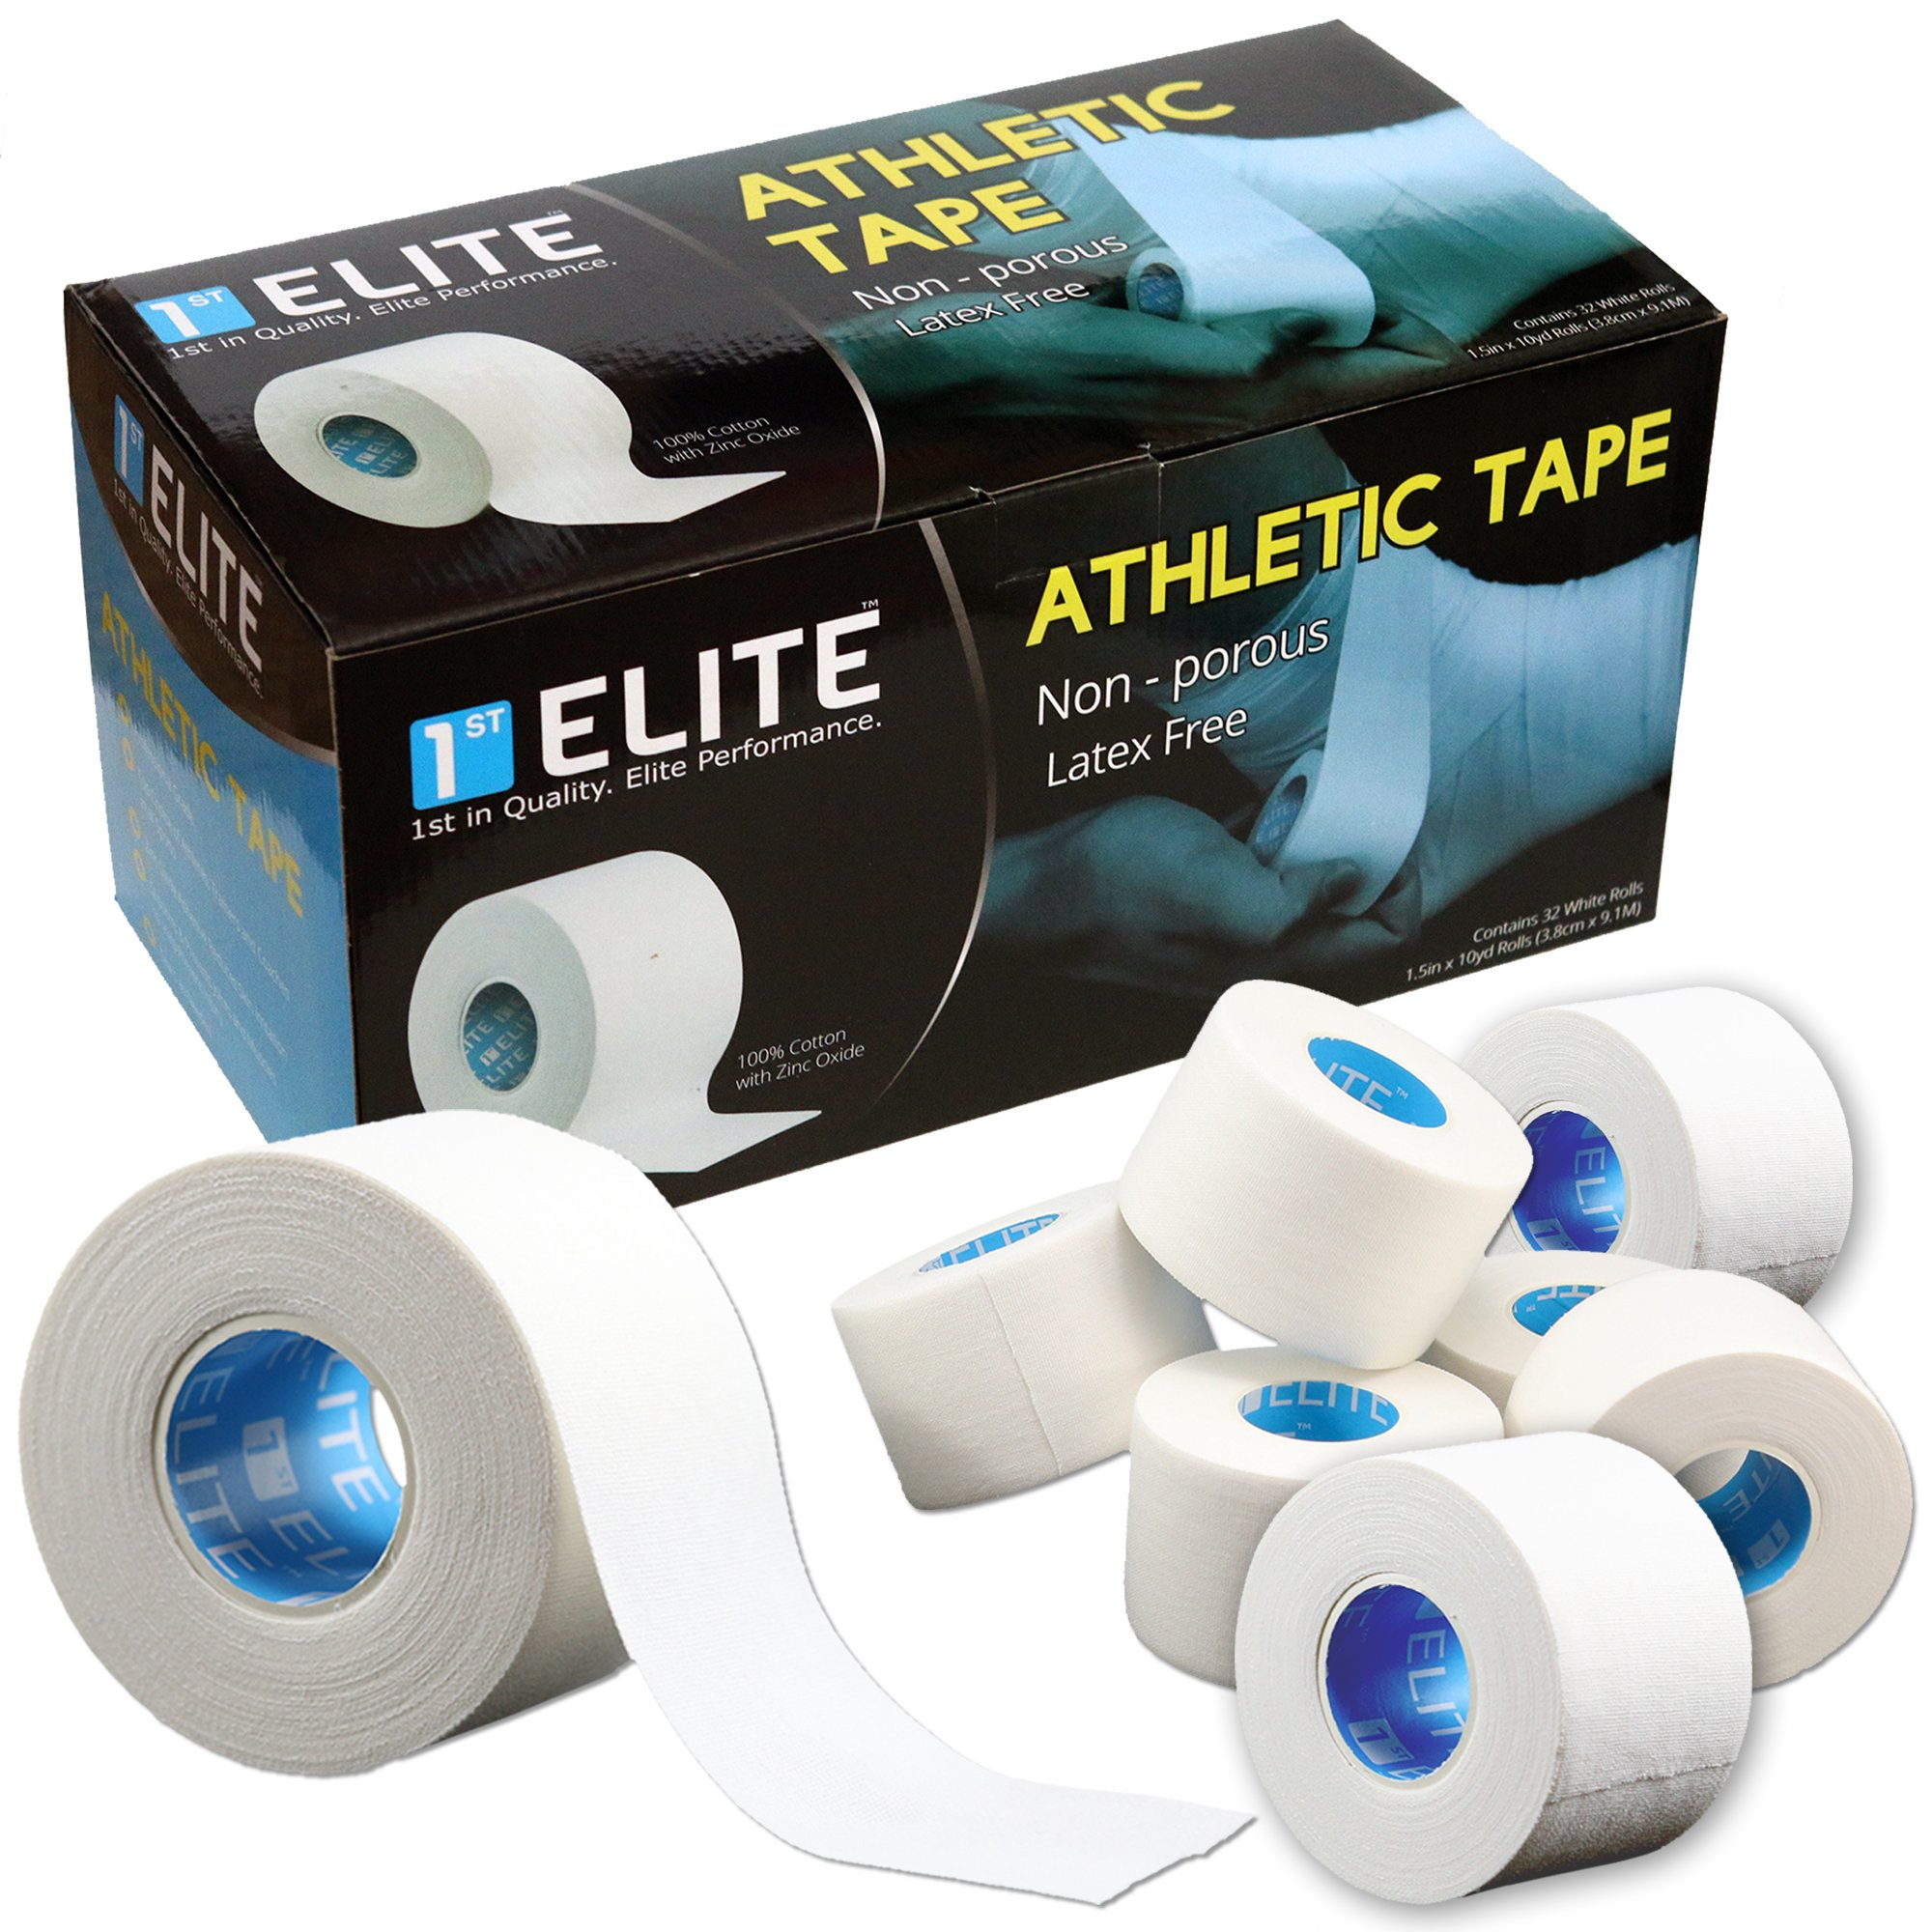 1st Elite Professional Athletic Tape for Elite Athletes Sports & Athletics - White Medical Grade Tapes to Wrap Finger Bat Prewrap (Bulk) by 1st Elite